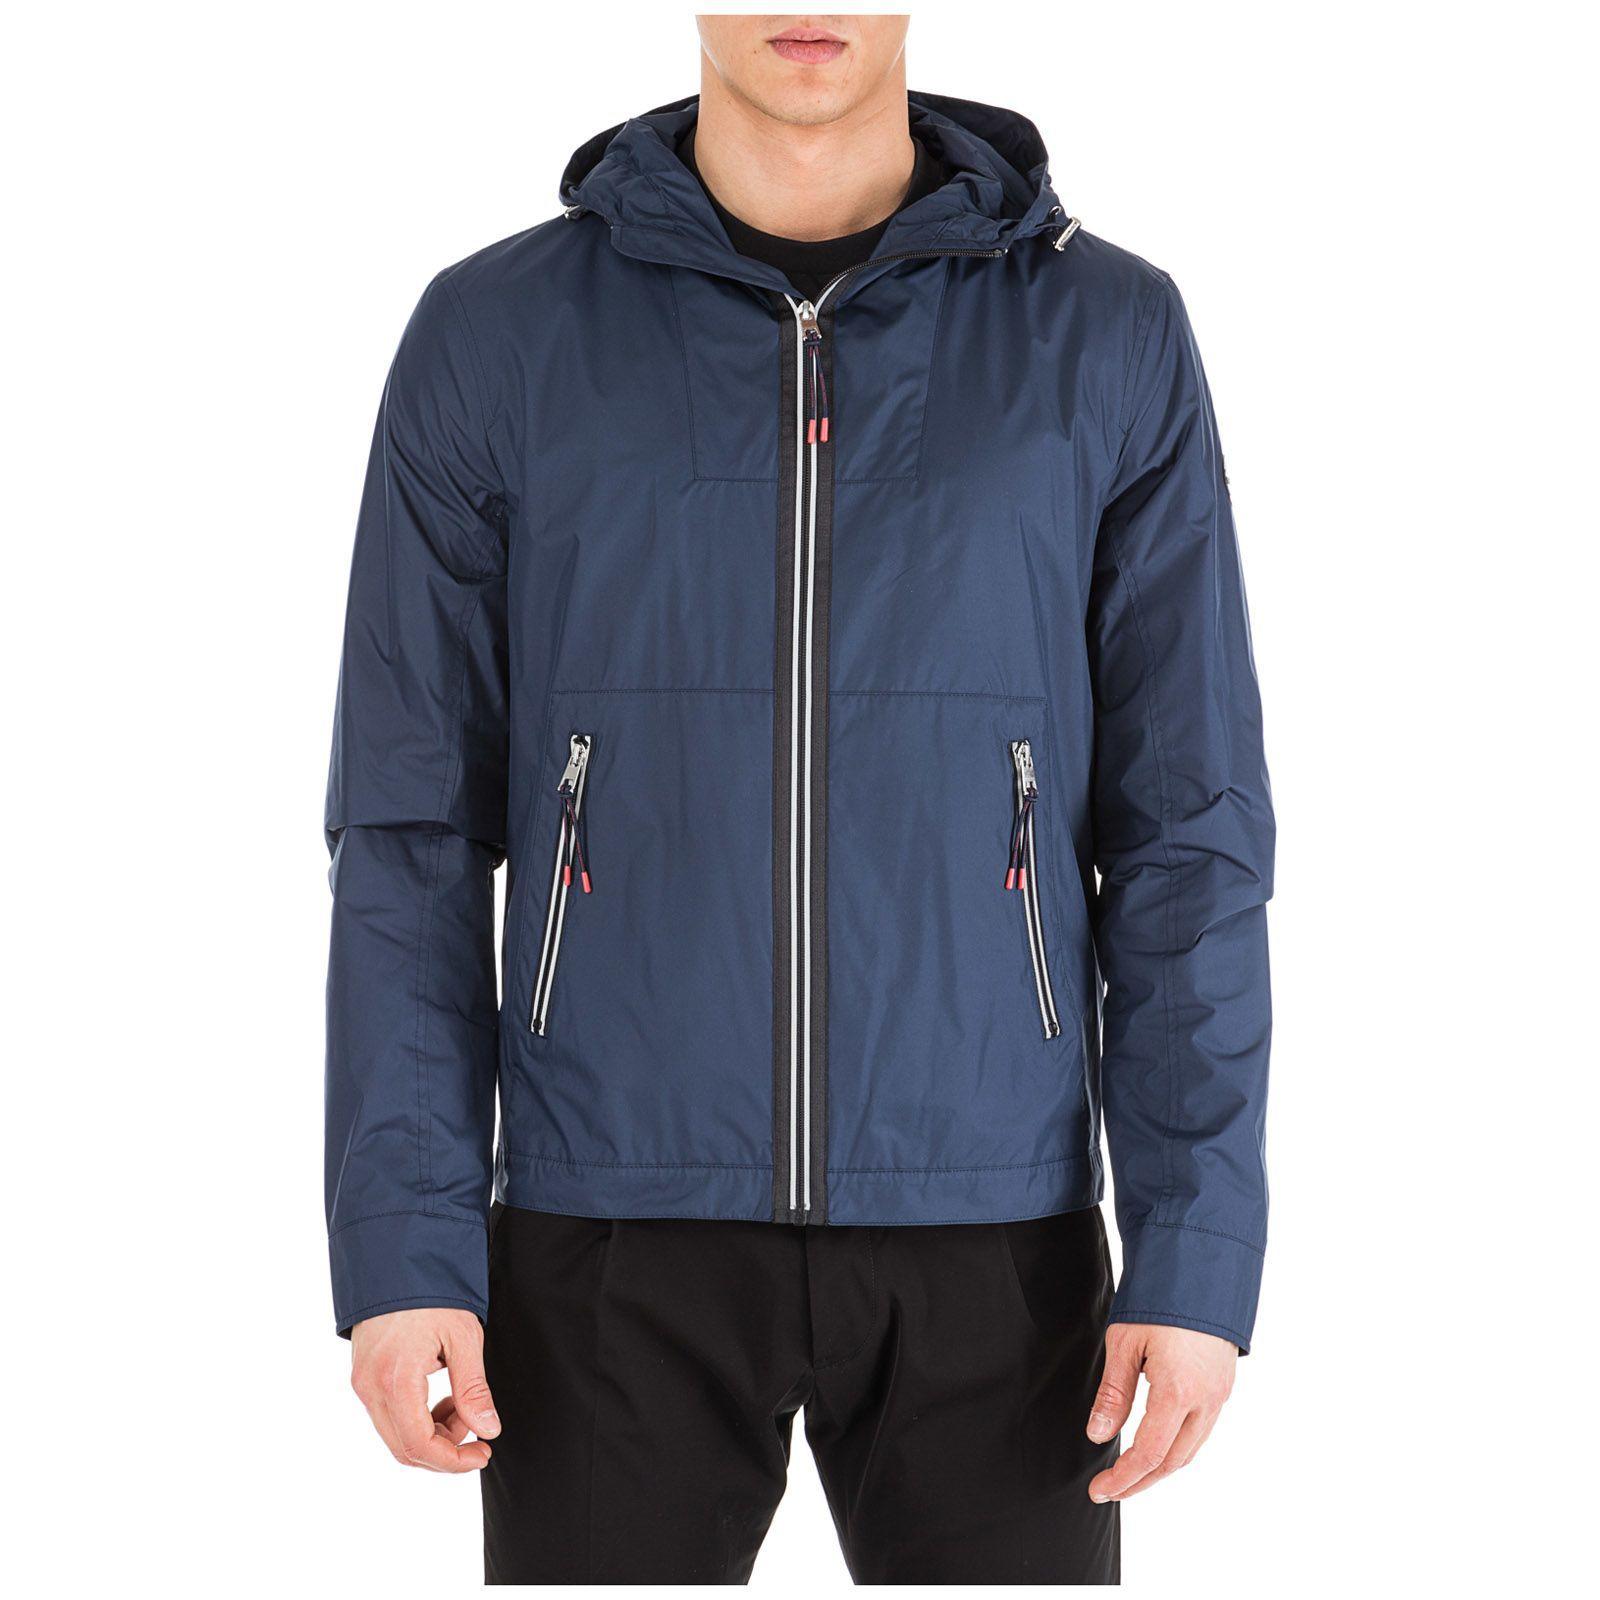 Michael Kors Outerwear Jacket Blouson Michaelkors Cloth [ 1600 x 1600 Pixel ]